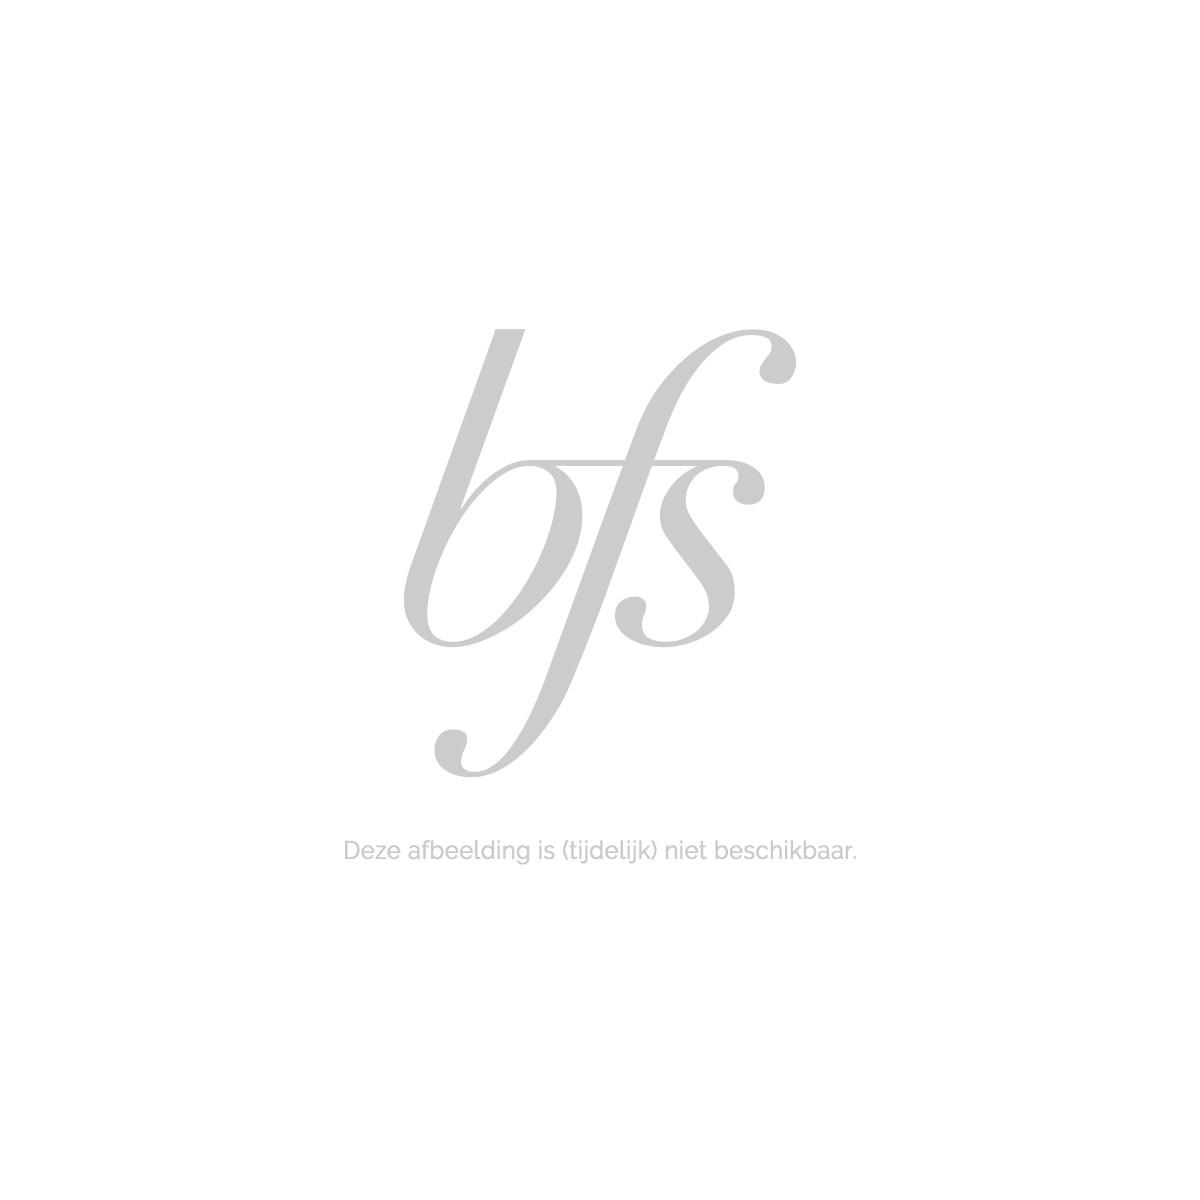 Guerlain Terracotta Powder #Classic 02 Natural Blondes 10 Gr